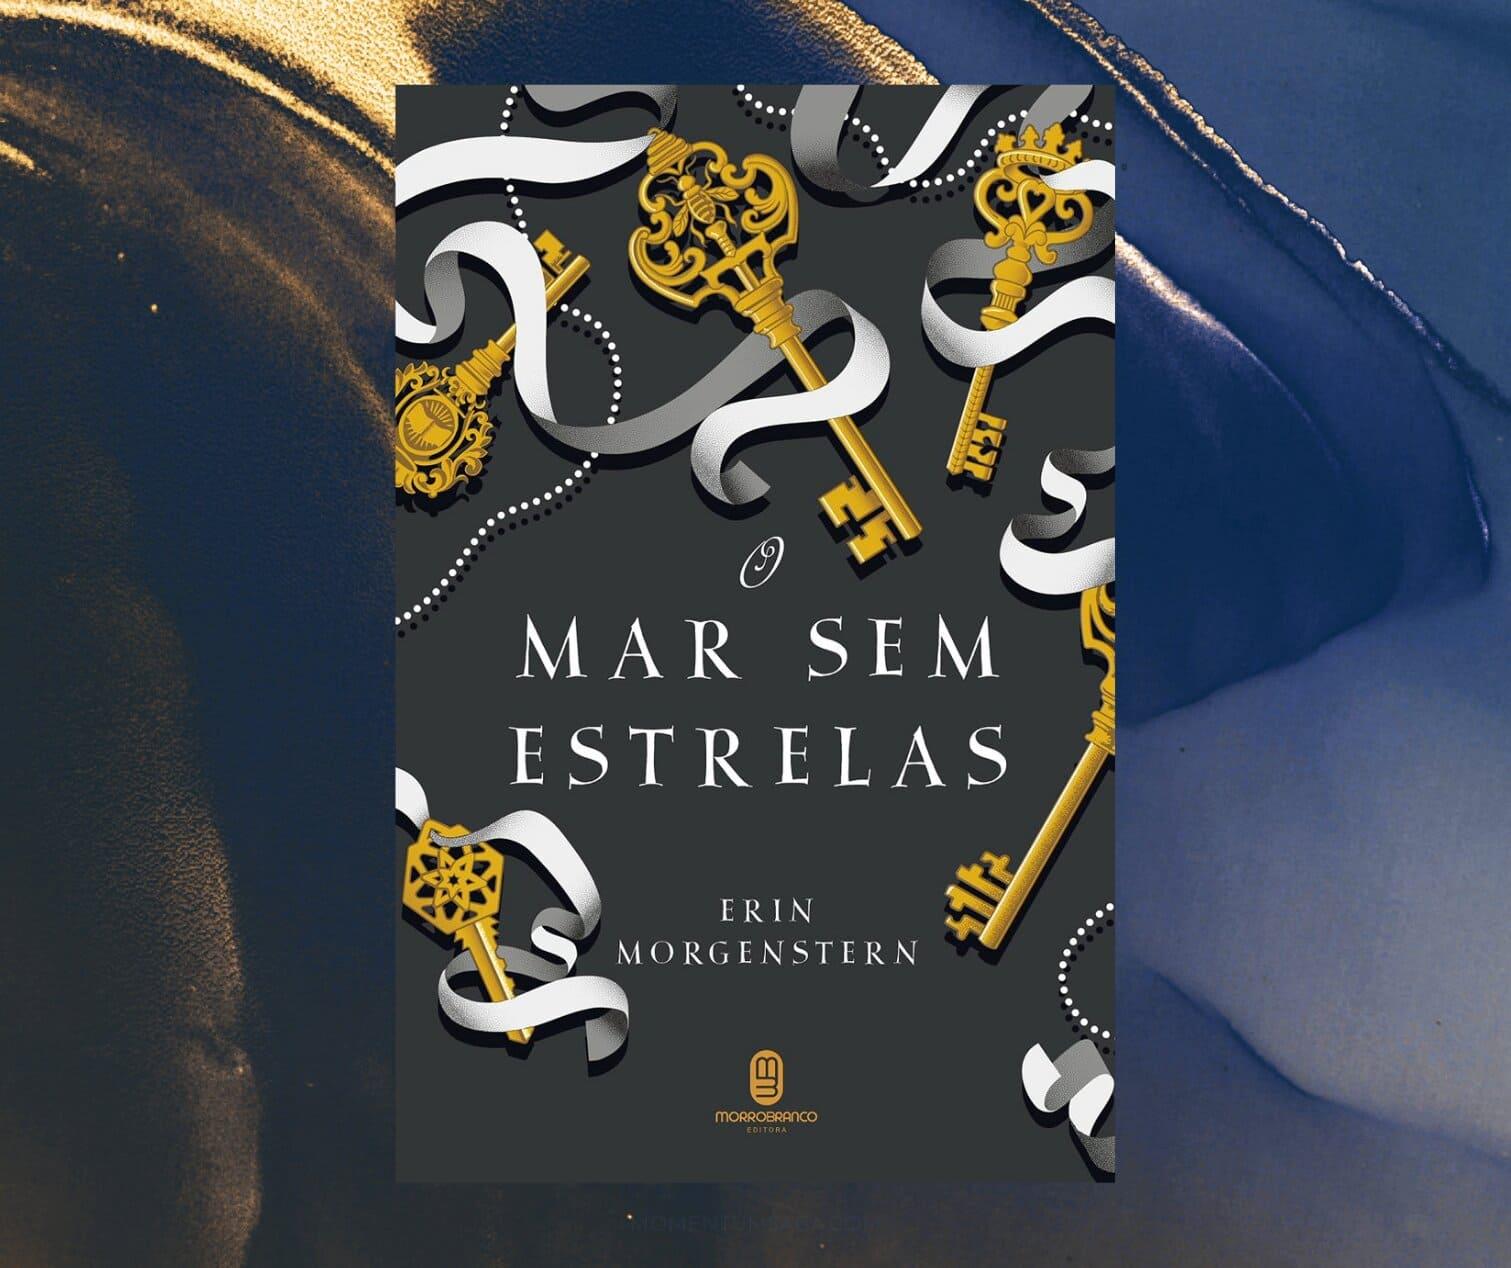 Resenha: O Mar Sem Estrelas, de Erin Morgenstern